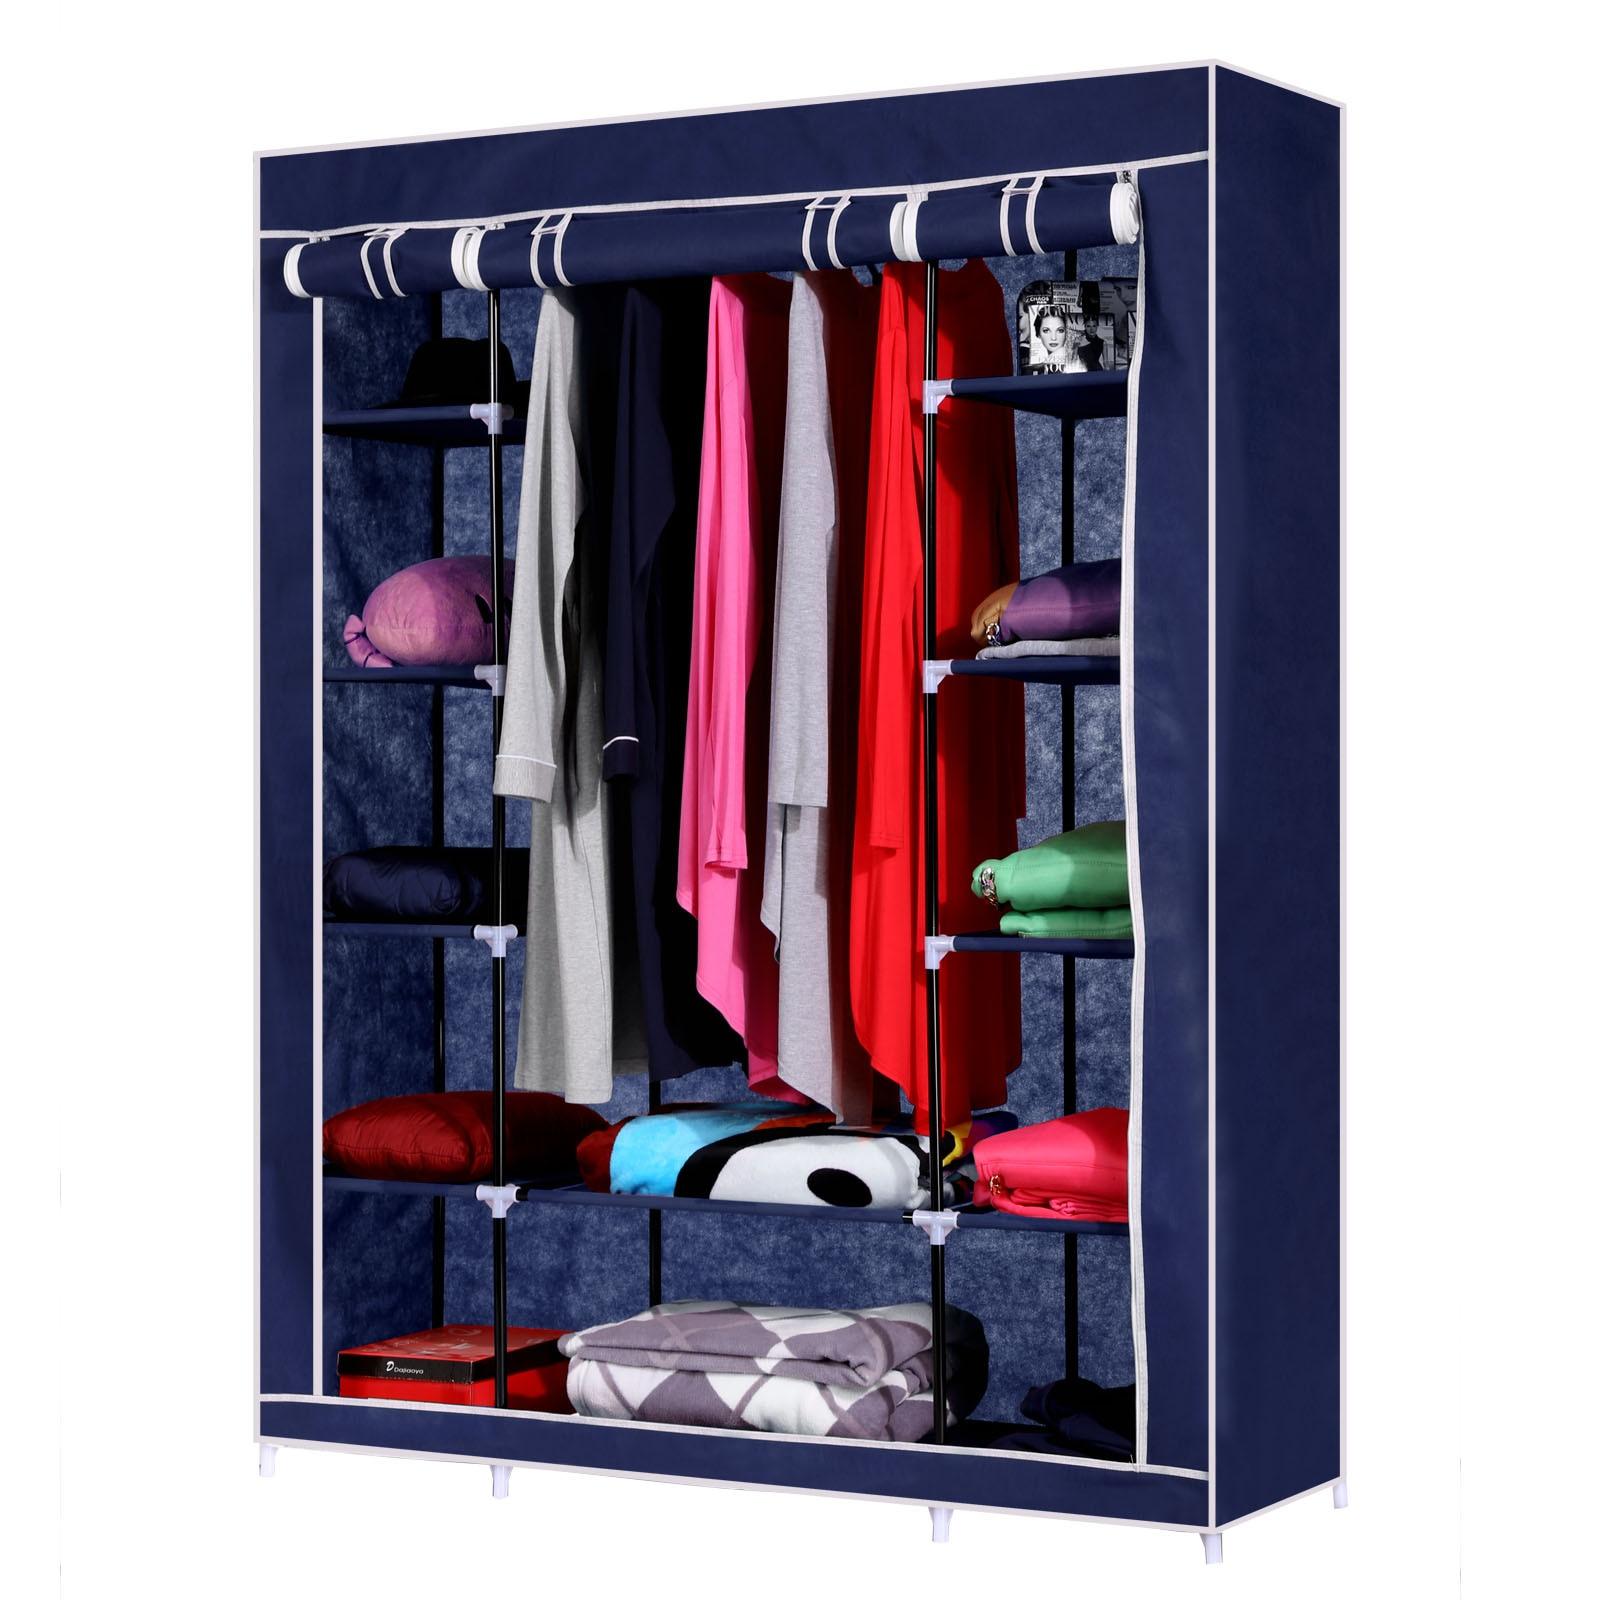 Homdox Non-Woven Wardrobe Combination Wardrobe Double Folding Wardrobe Assembling Home Furnishing Decoration Coat Hangers #30-27<br>